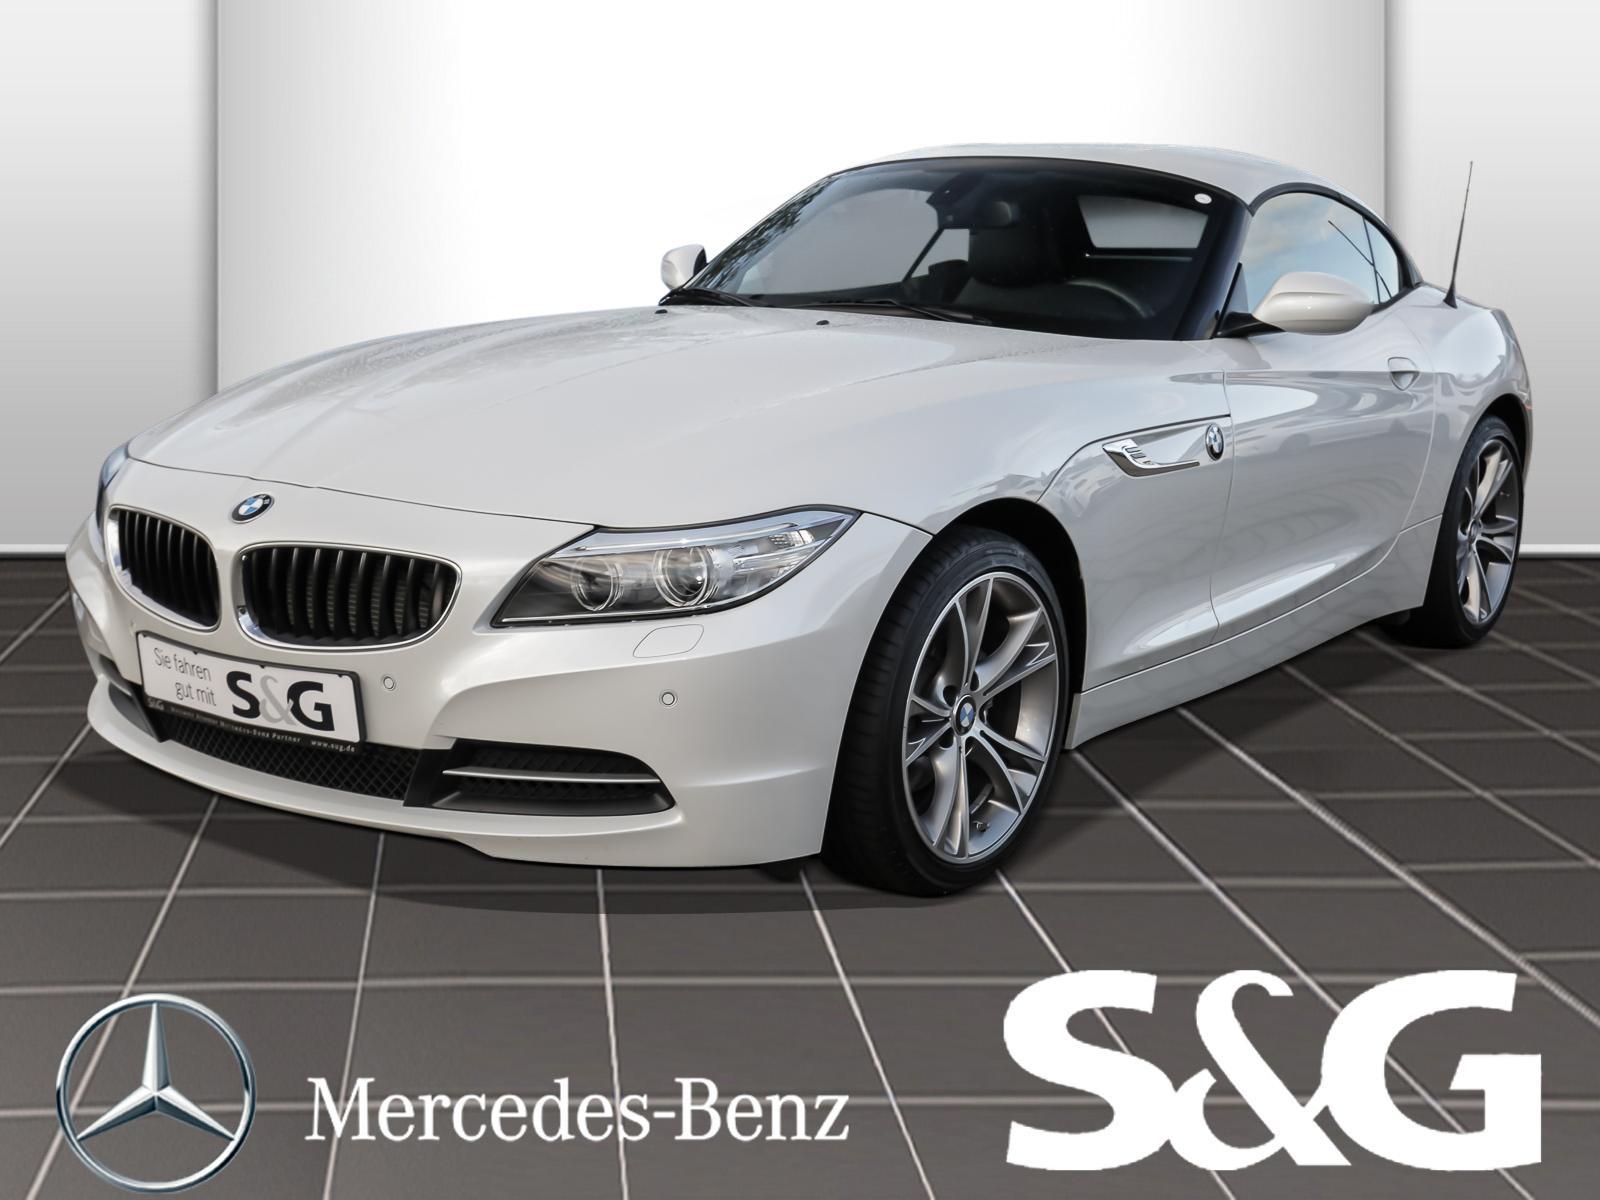 BMW Z4 sDrive Leder/DAB/Xenon/Kessy/ACC/Einparkhilfe, Jahr 2015, Benzin